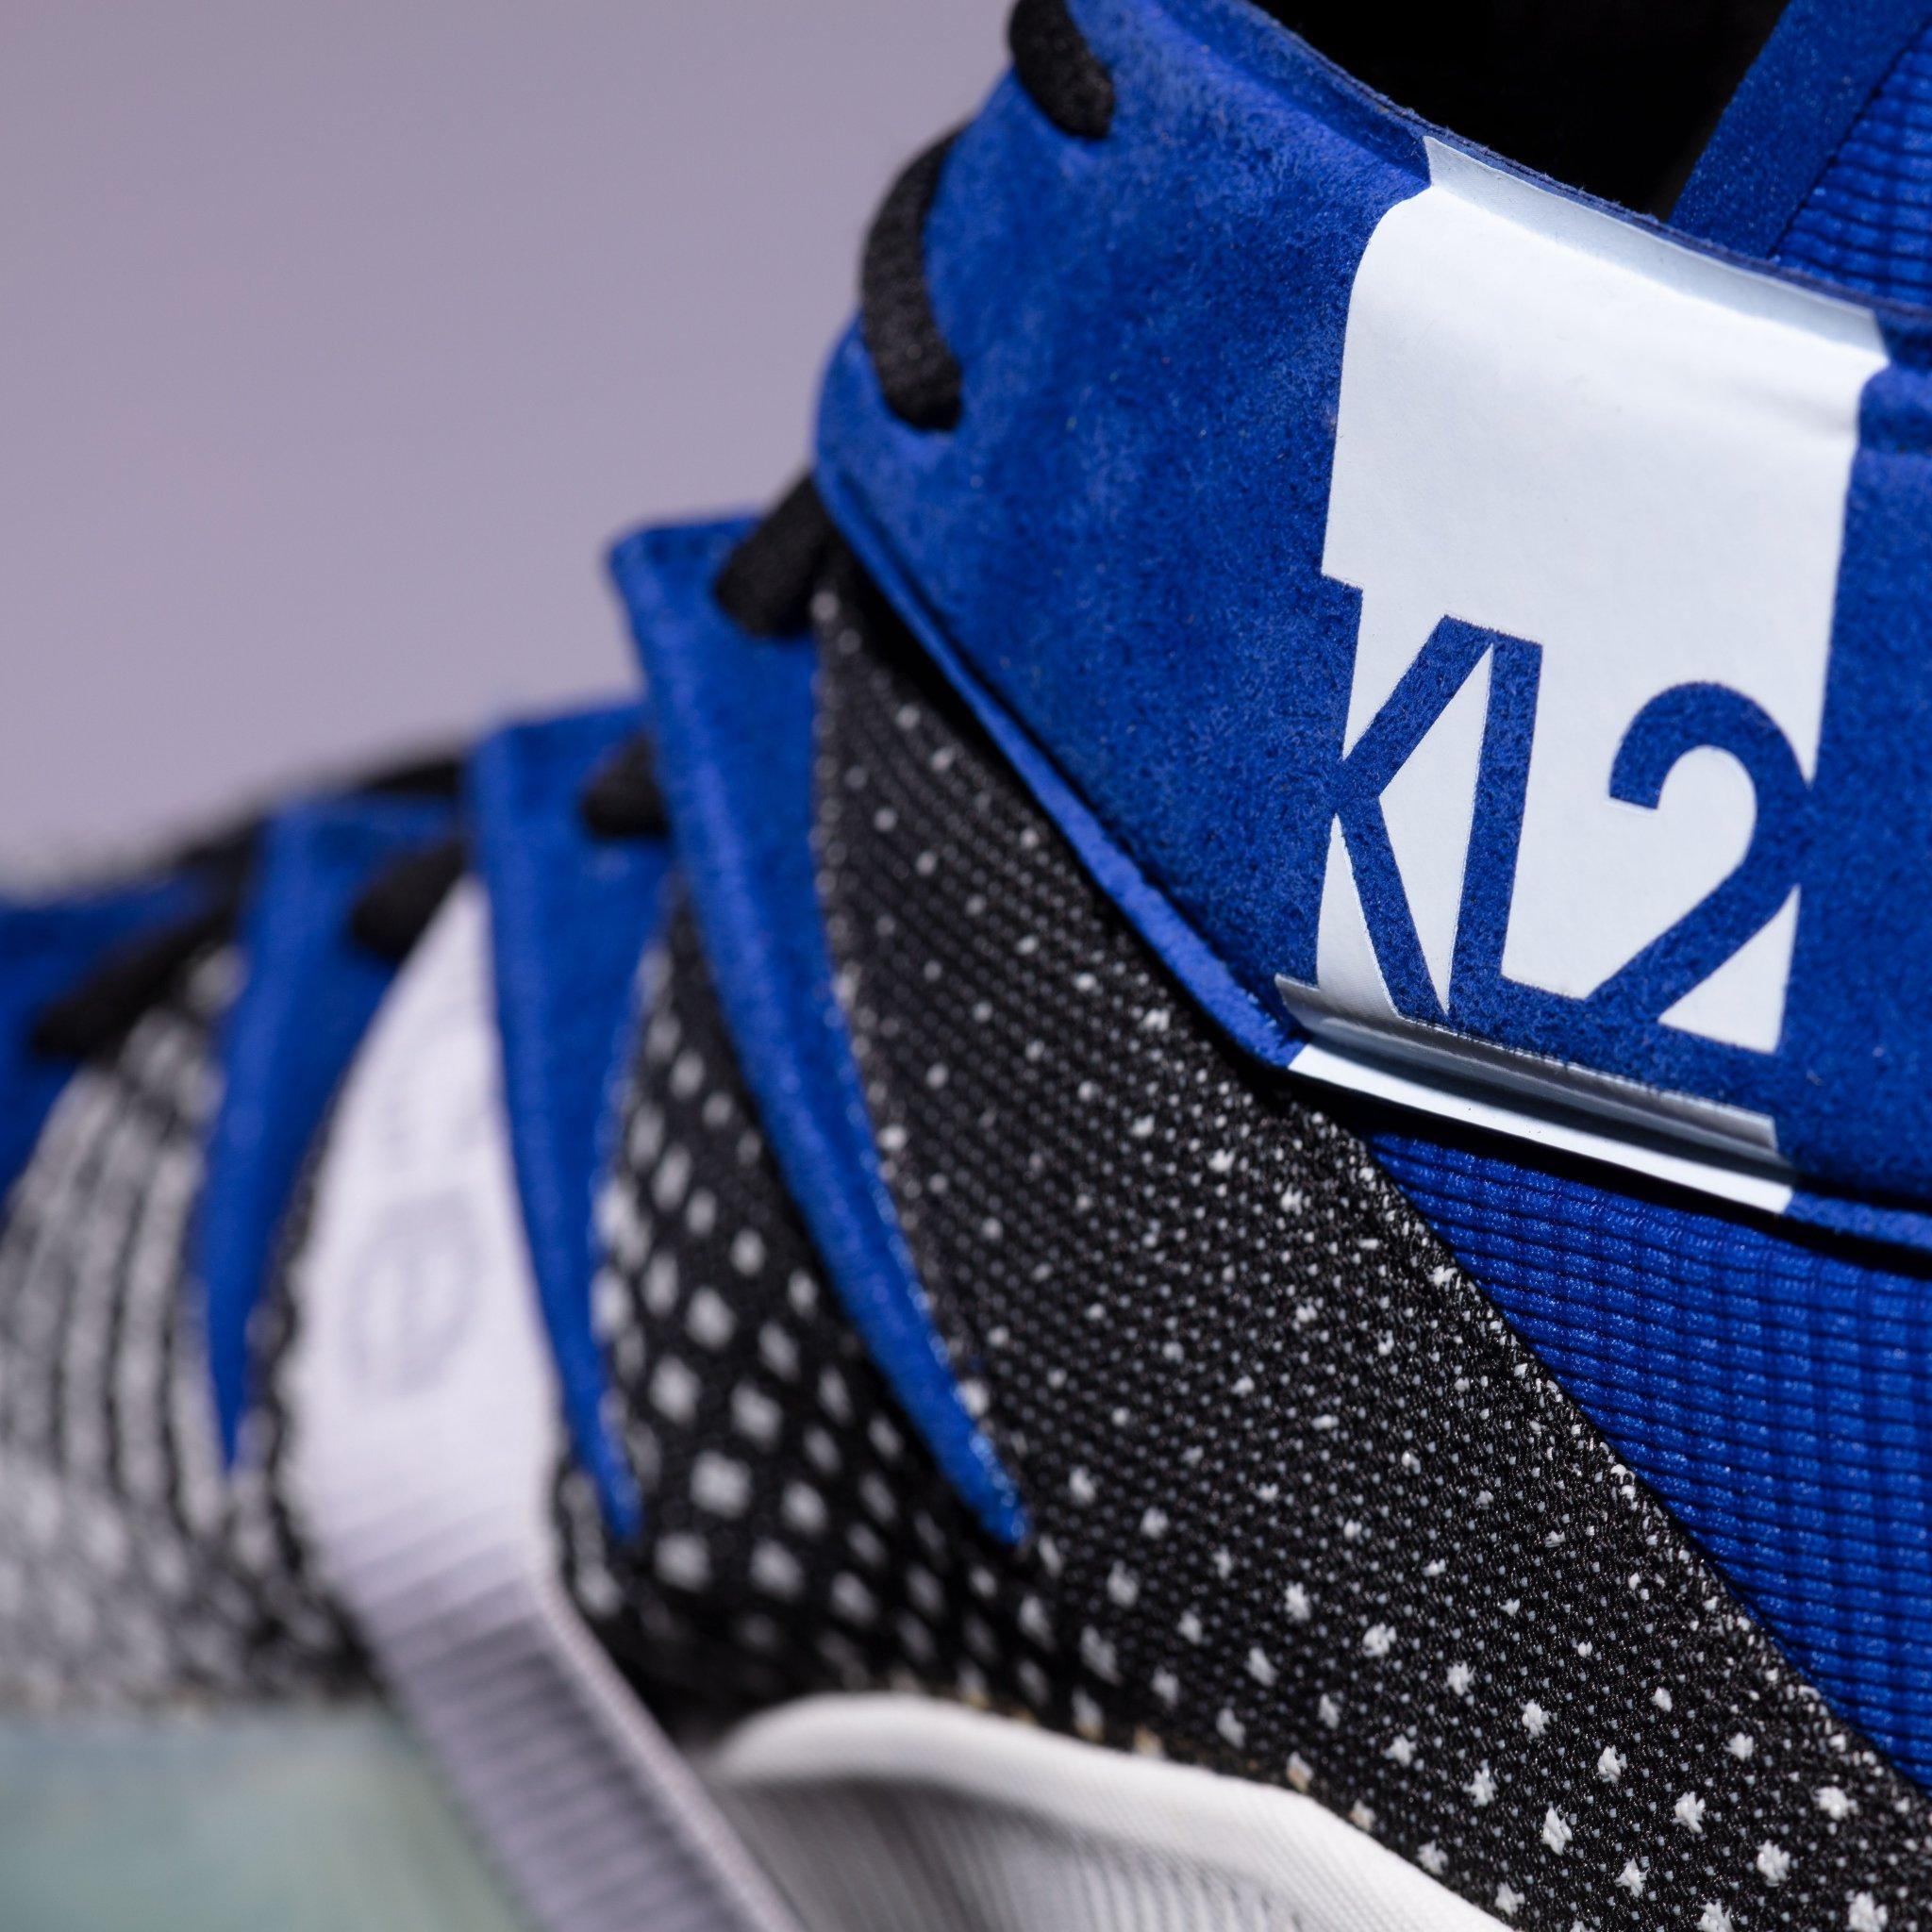 1312bffa1 New Balance dévoile la chaussure de Kawhi Leonard | Basket USA